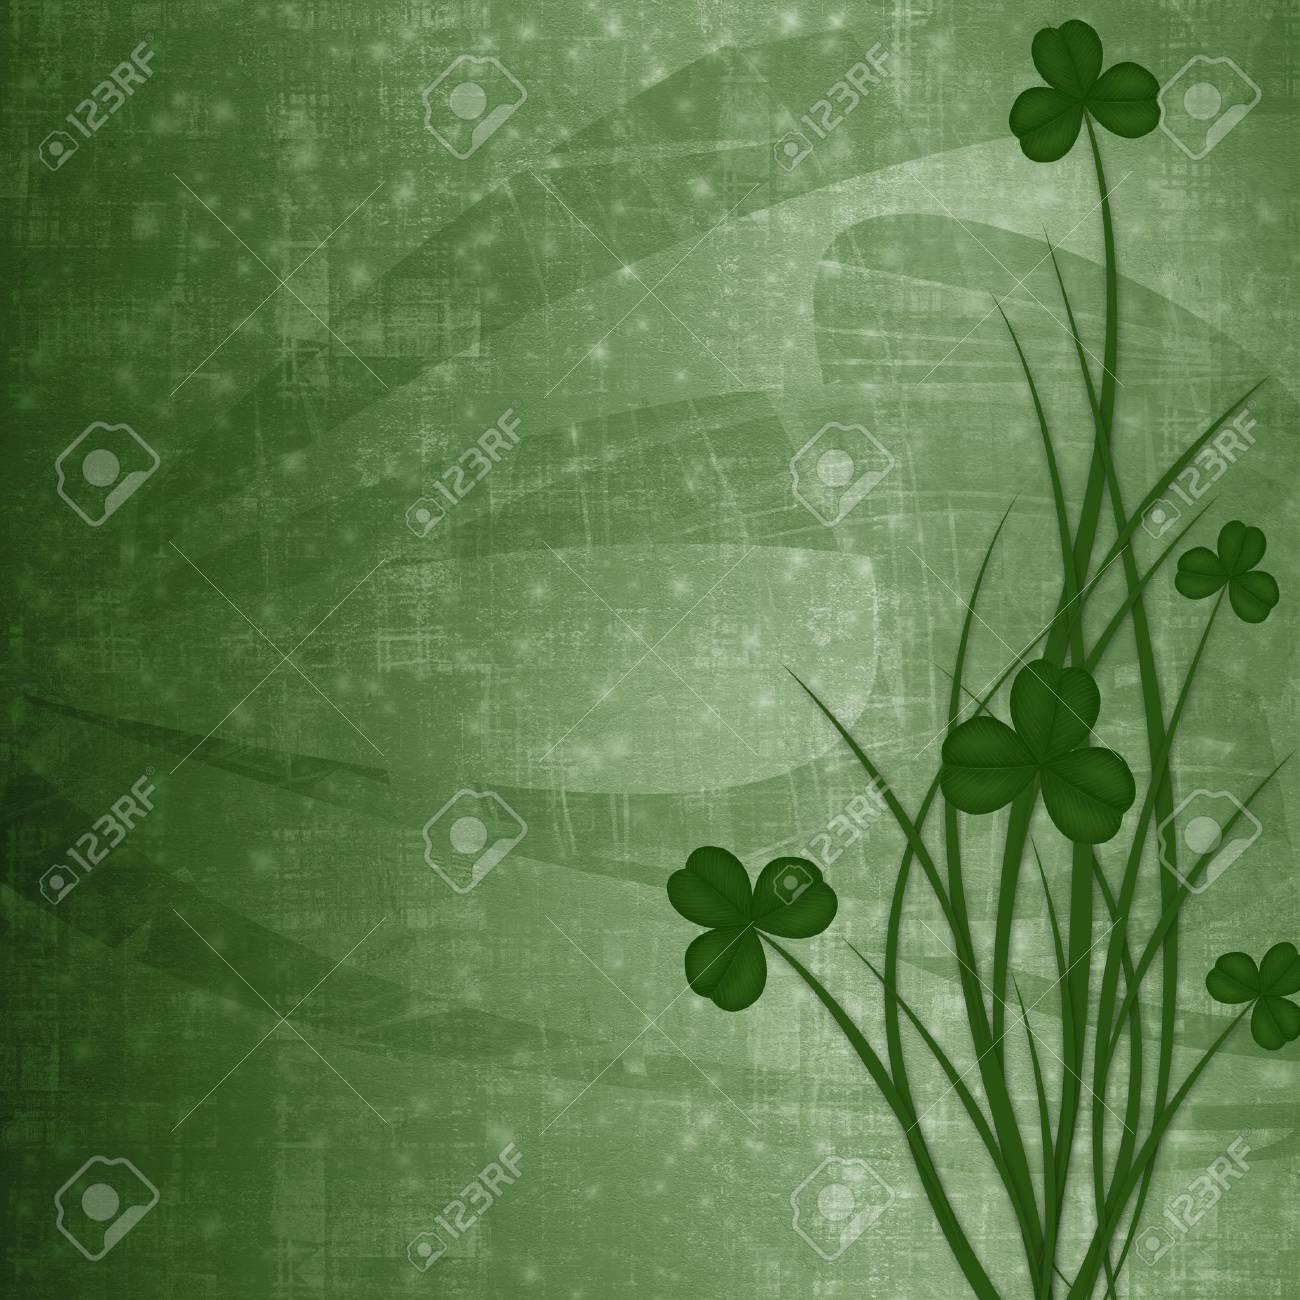 Design for St. Patrick's Day. Flower ornament. Stock Photo - 17918674